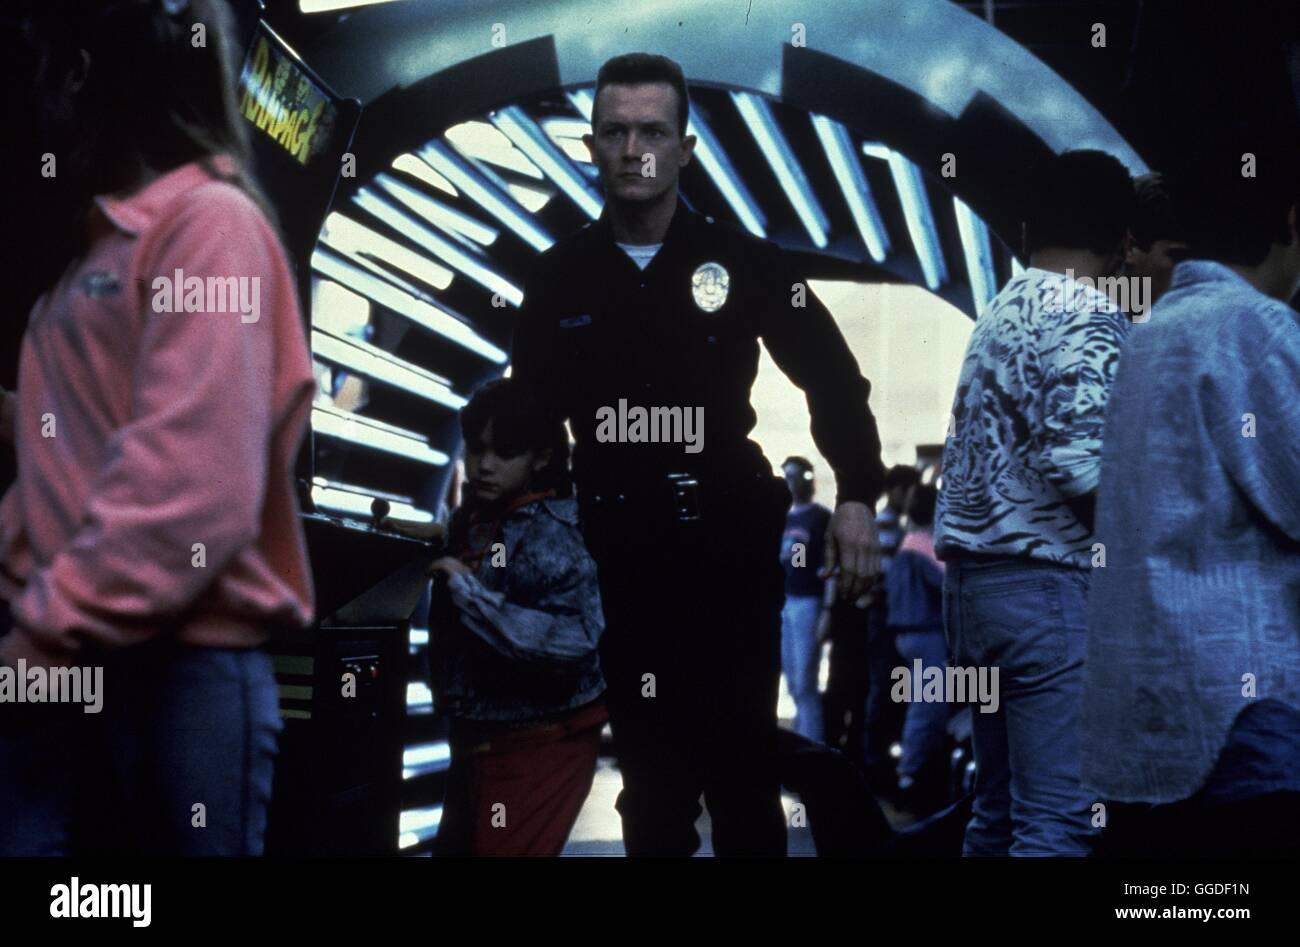 TERMINATOR II - TAG DER ABRECHNUNG / Terminator II - Judgement Day USA 1991 / James Cameron Szene mit ROBERT PATRICK - Stock Image